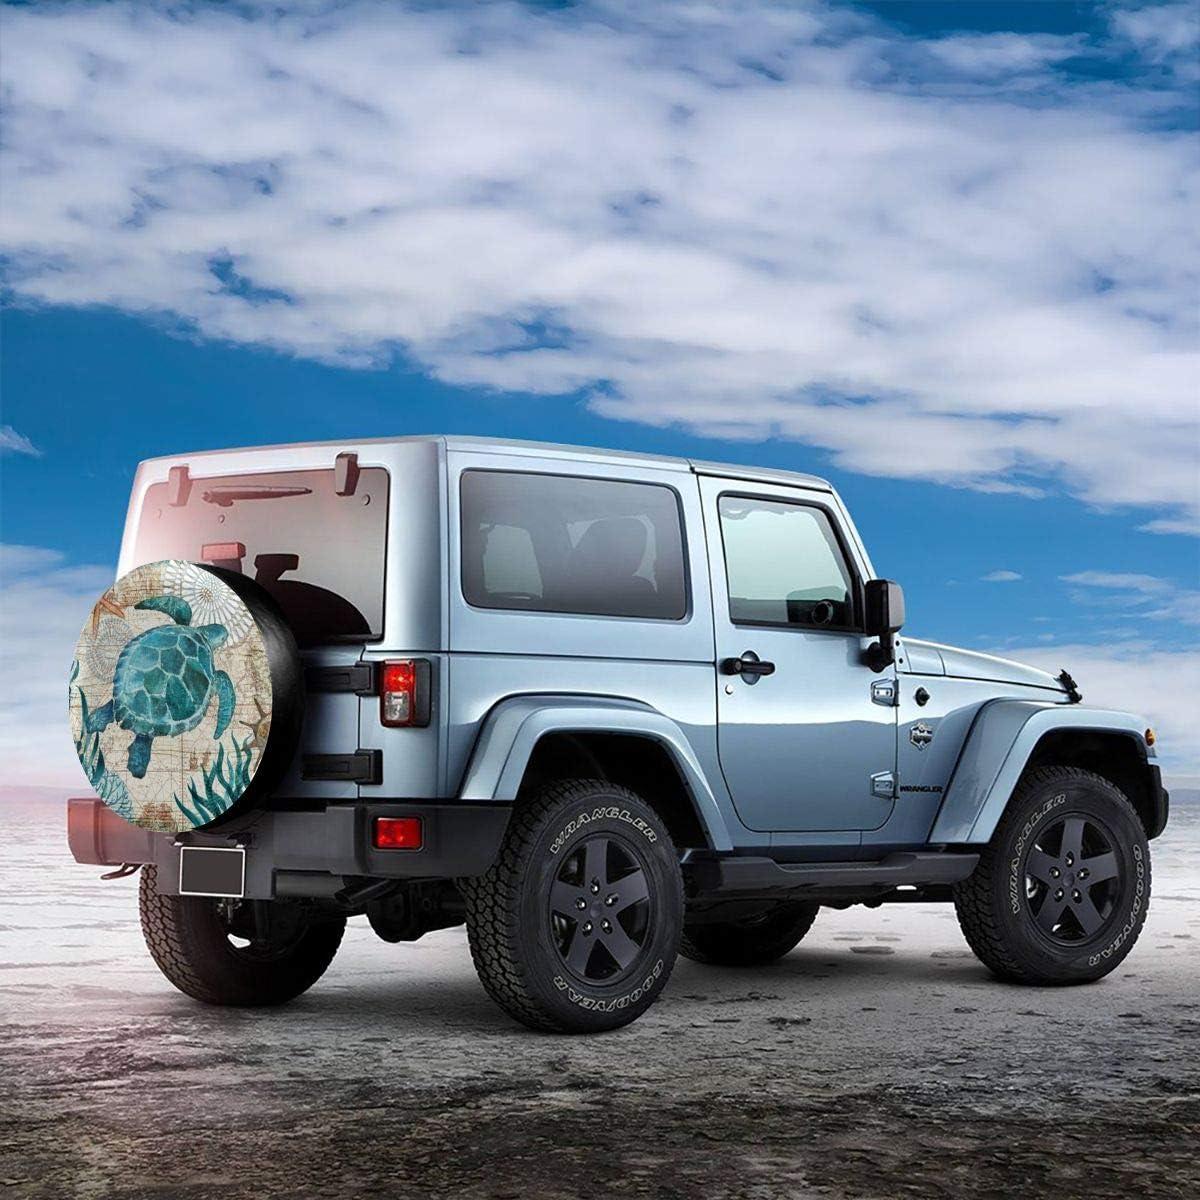 MSGUIDE Spare Tire Cover Sea Turtle for Jeep Trailer Rv Truck 14 15 16 17 Inch Sunscreen Dustproof Corrosion Proof Wheel Cover